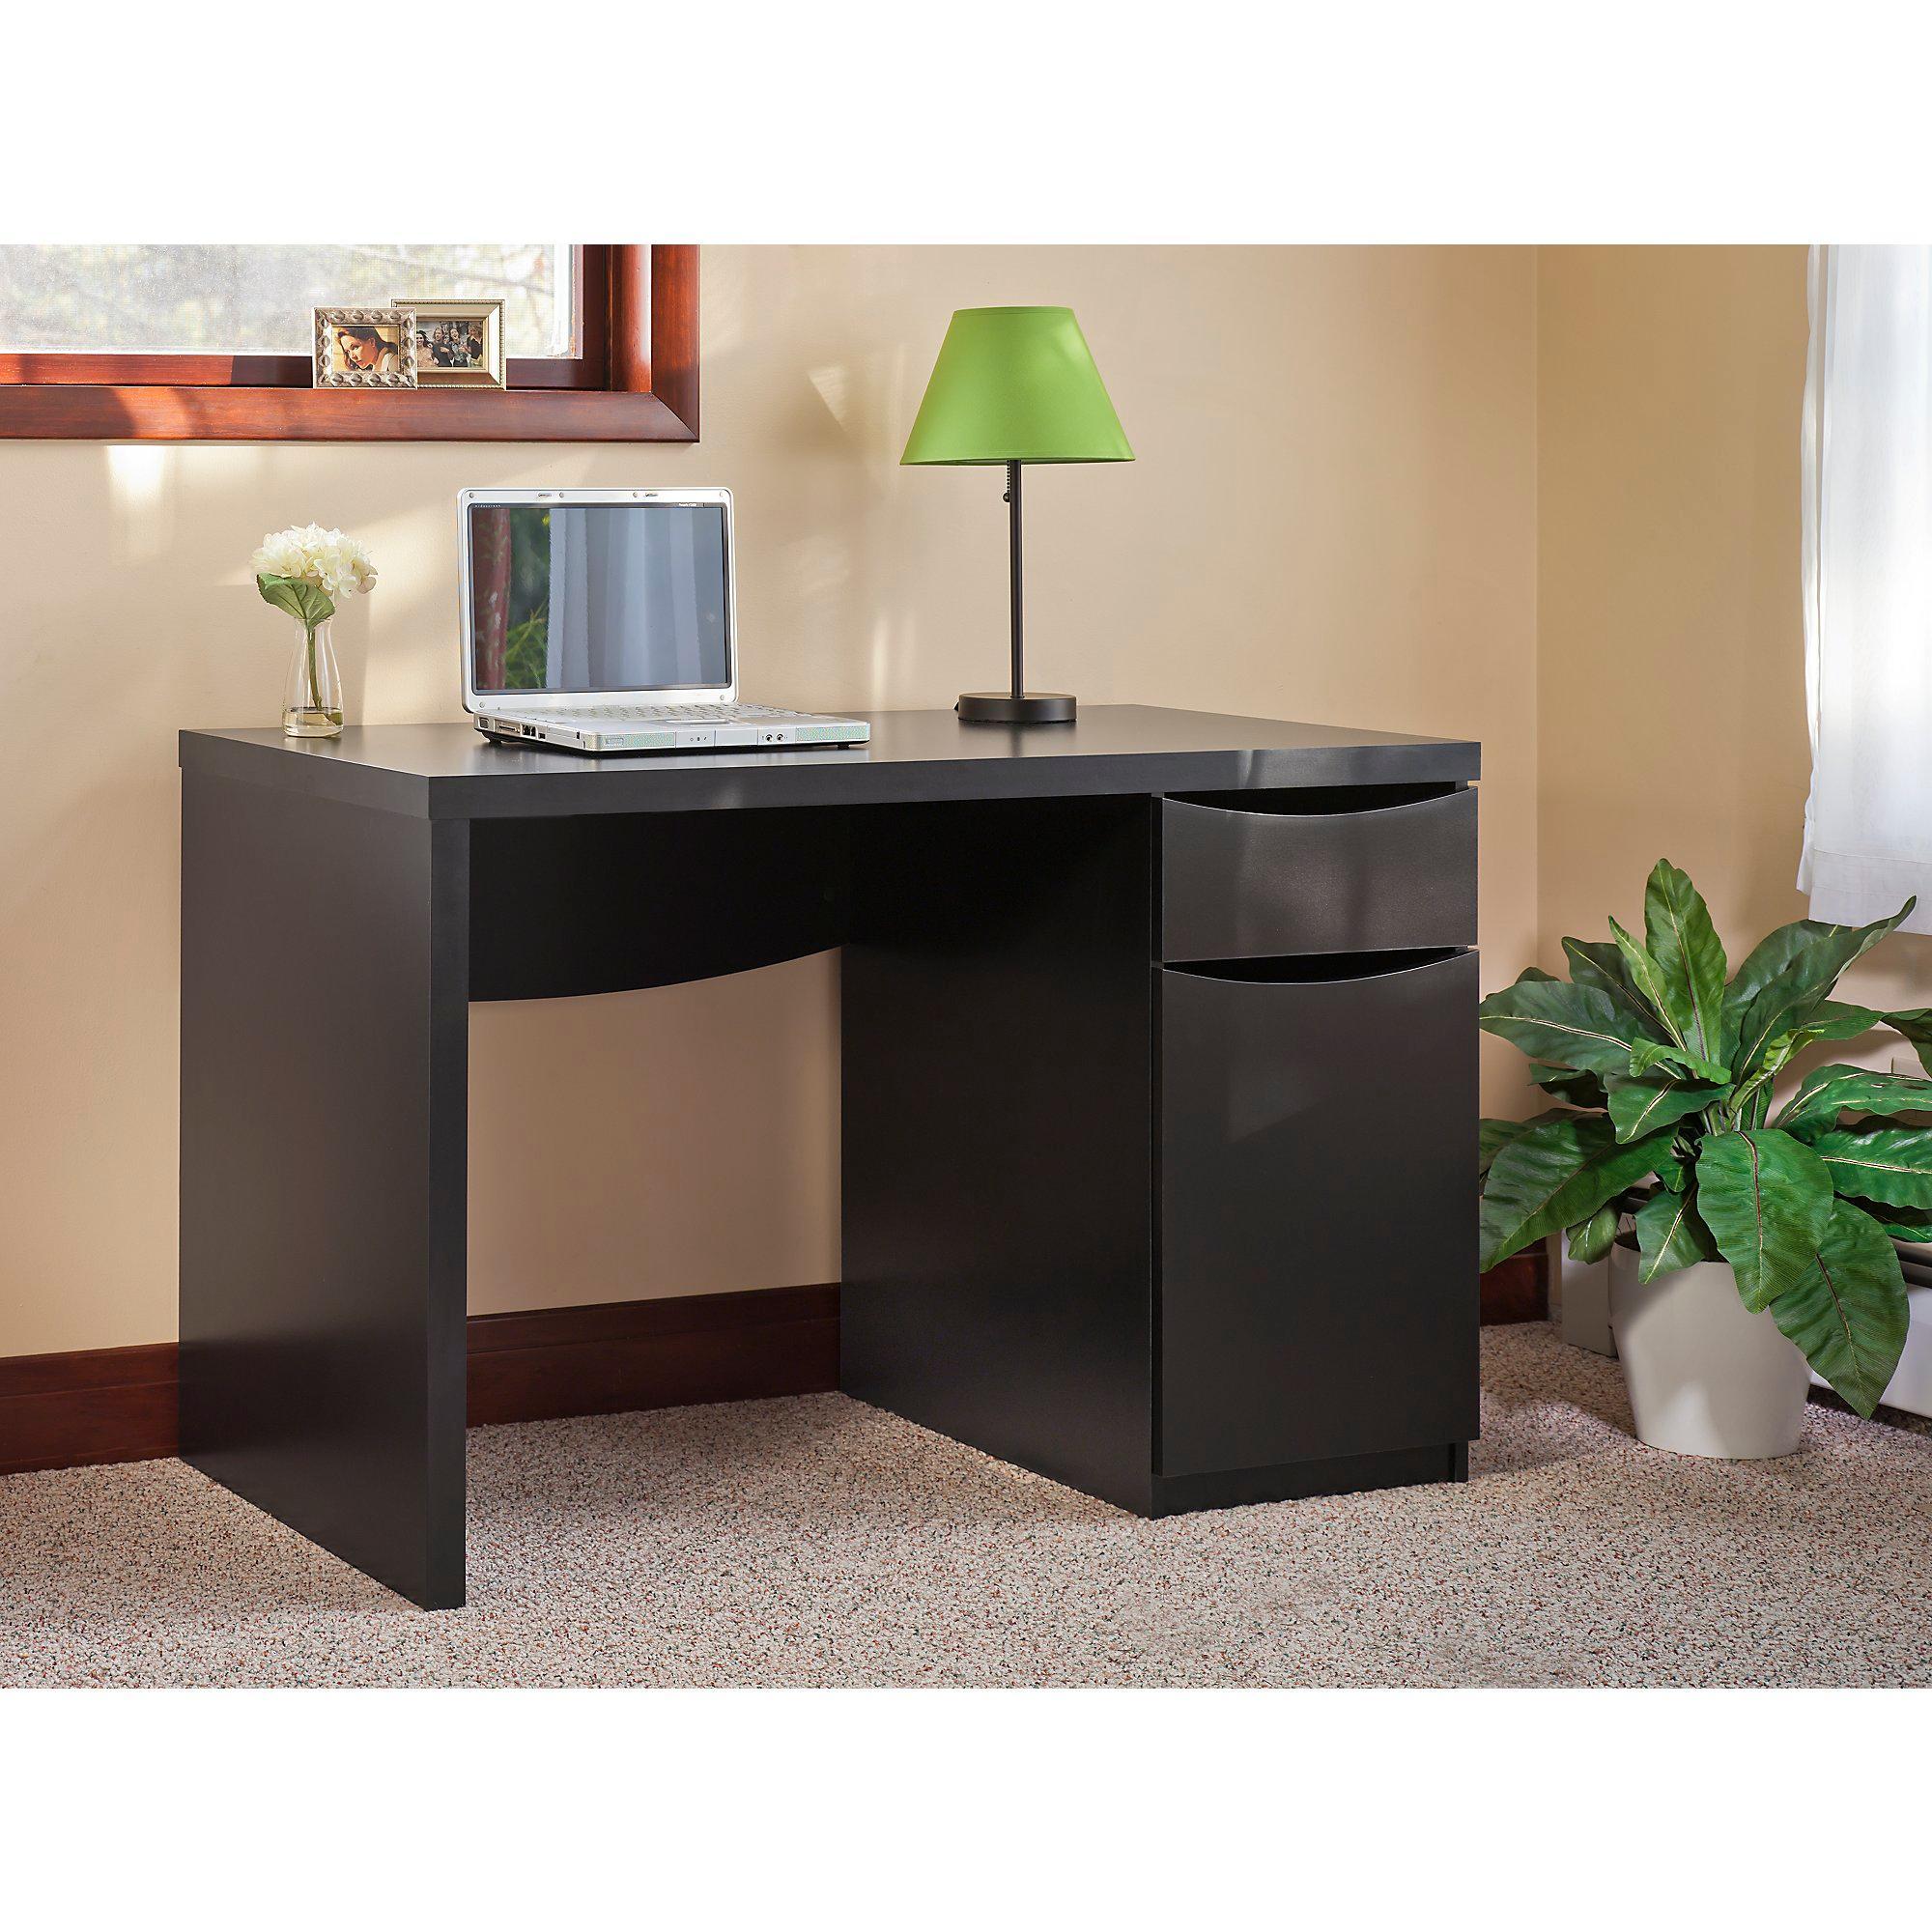 Amazon.com: Montrese Computer Desk: Kitchen & Dining